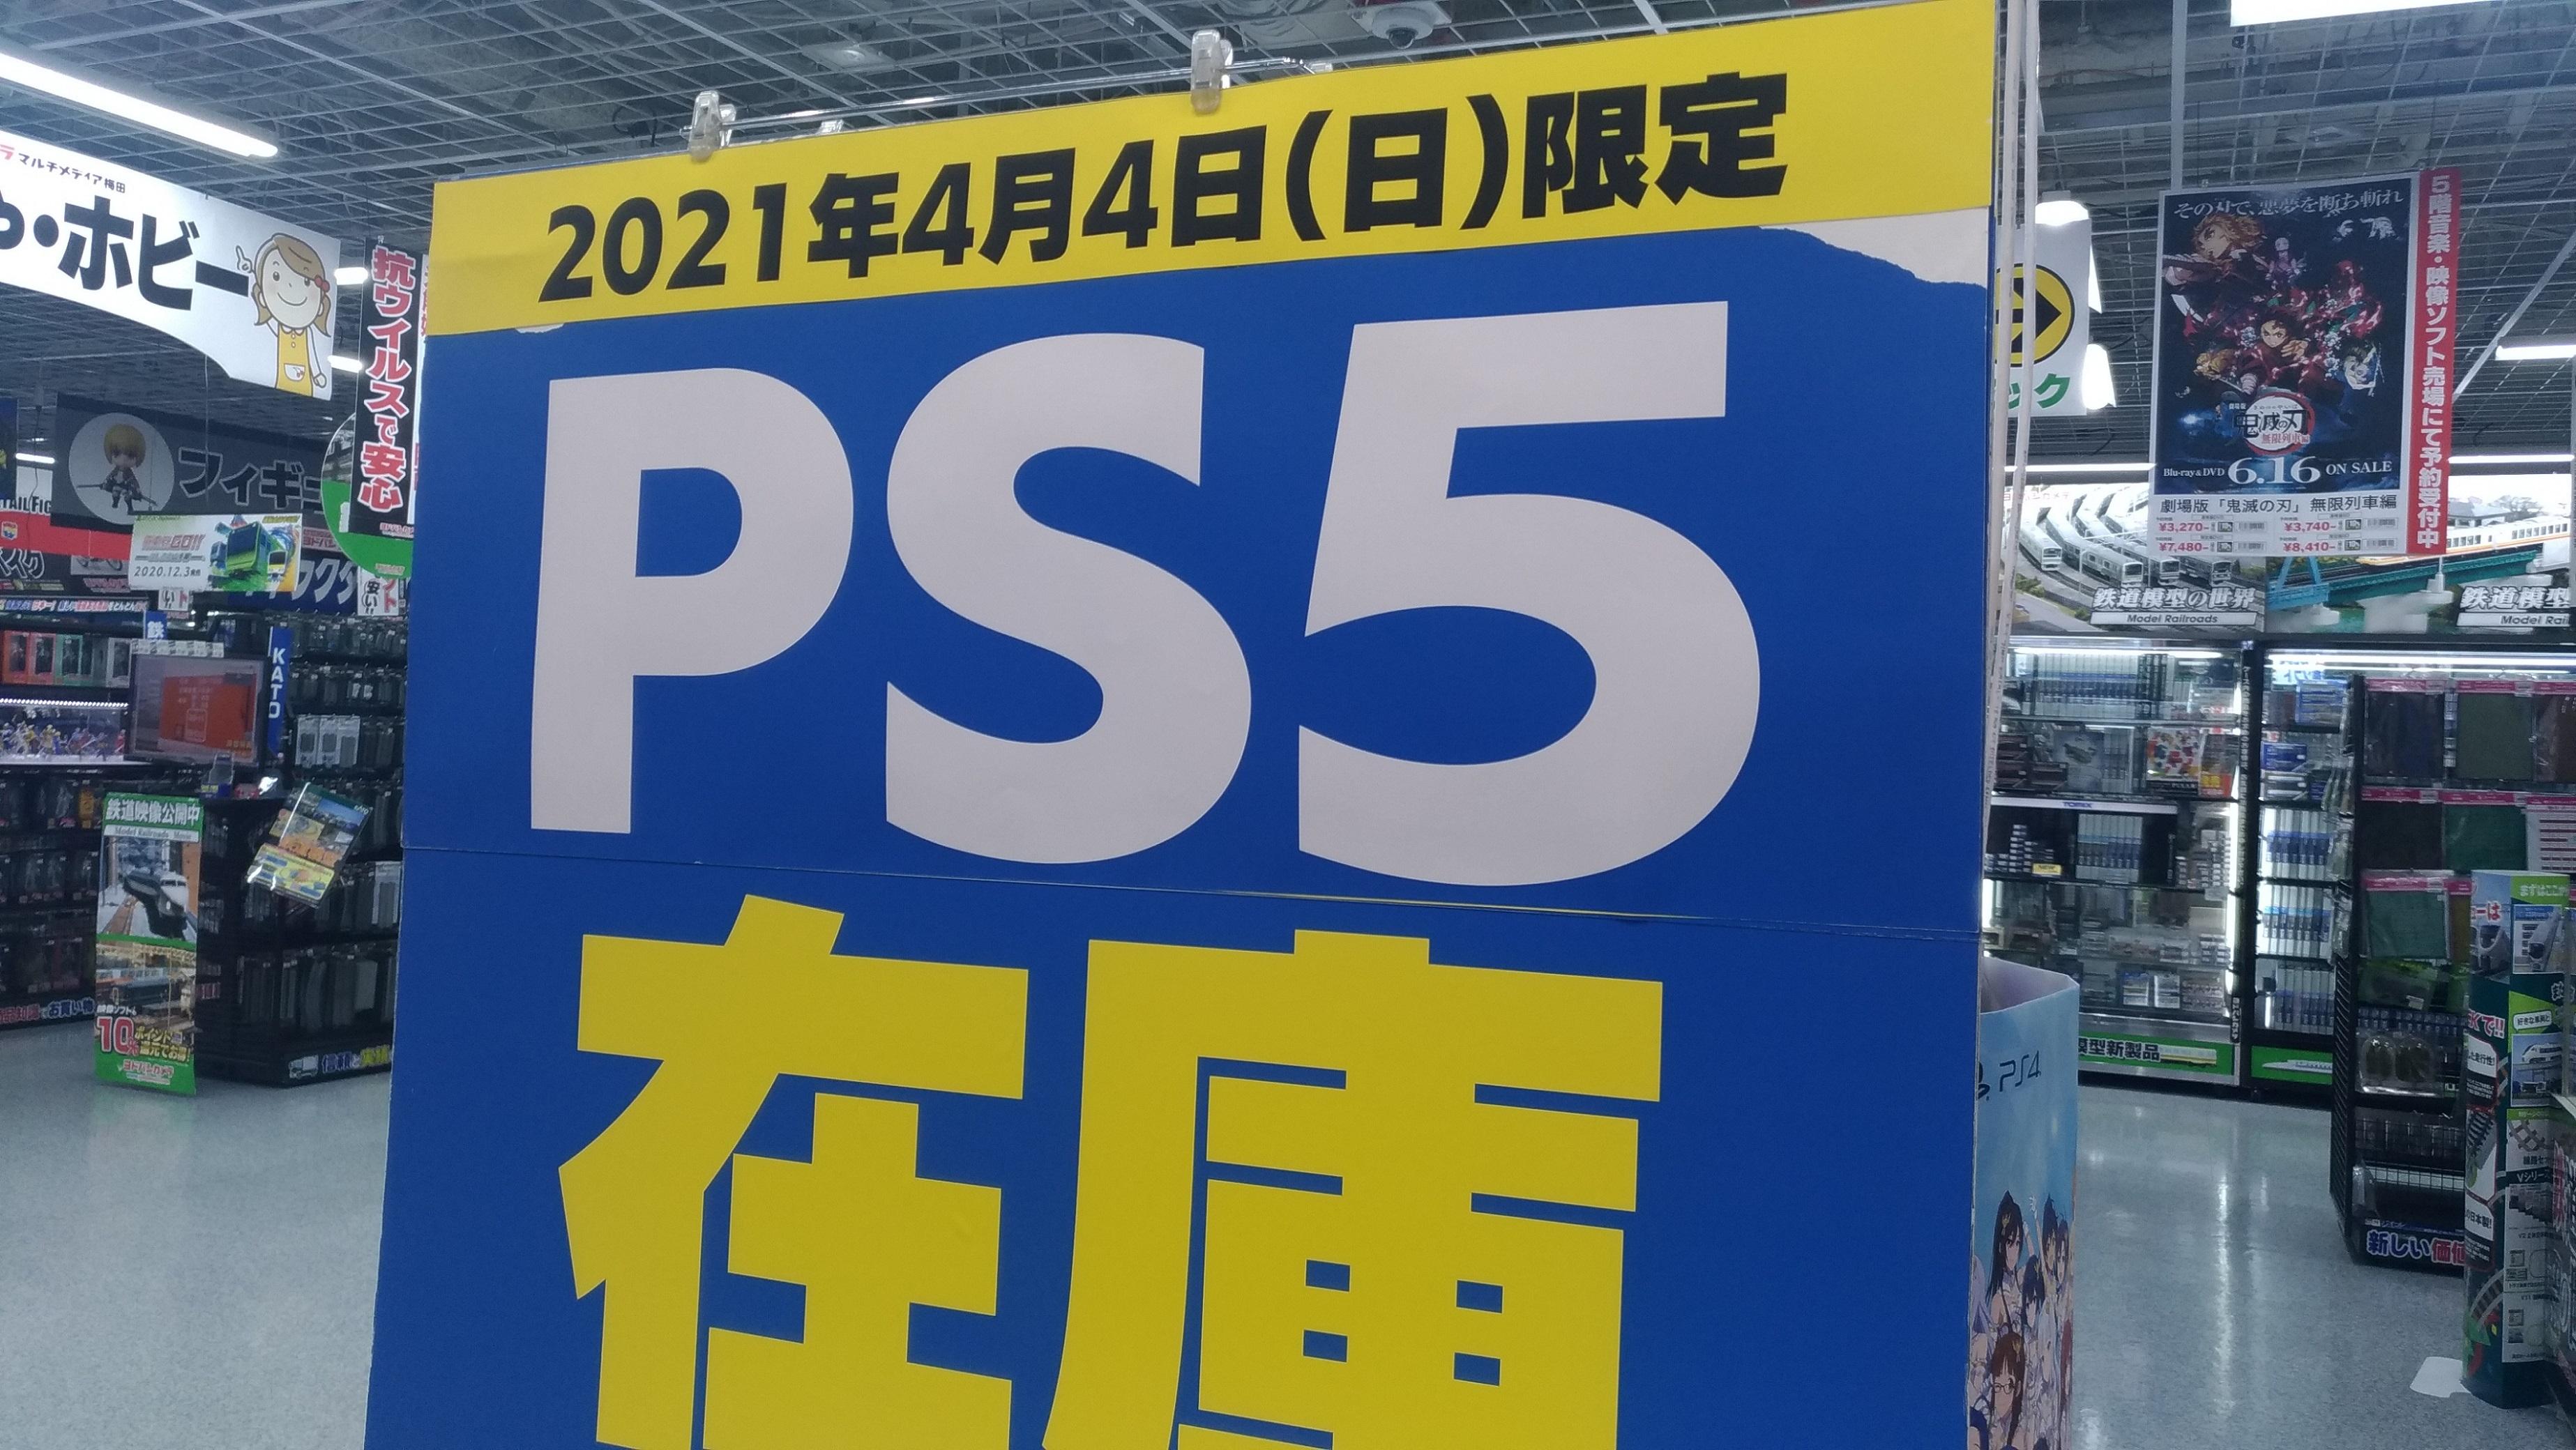 ps5_0404_yodobashi_umeda_.jpg